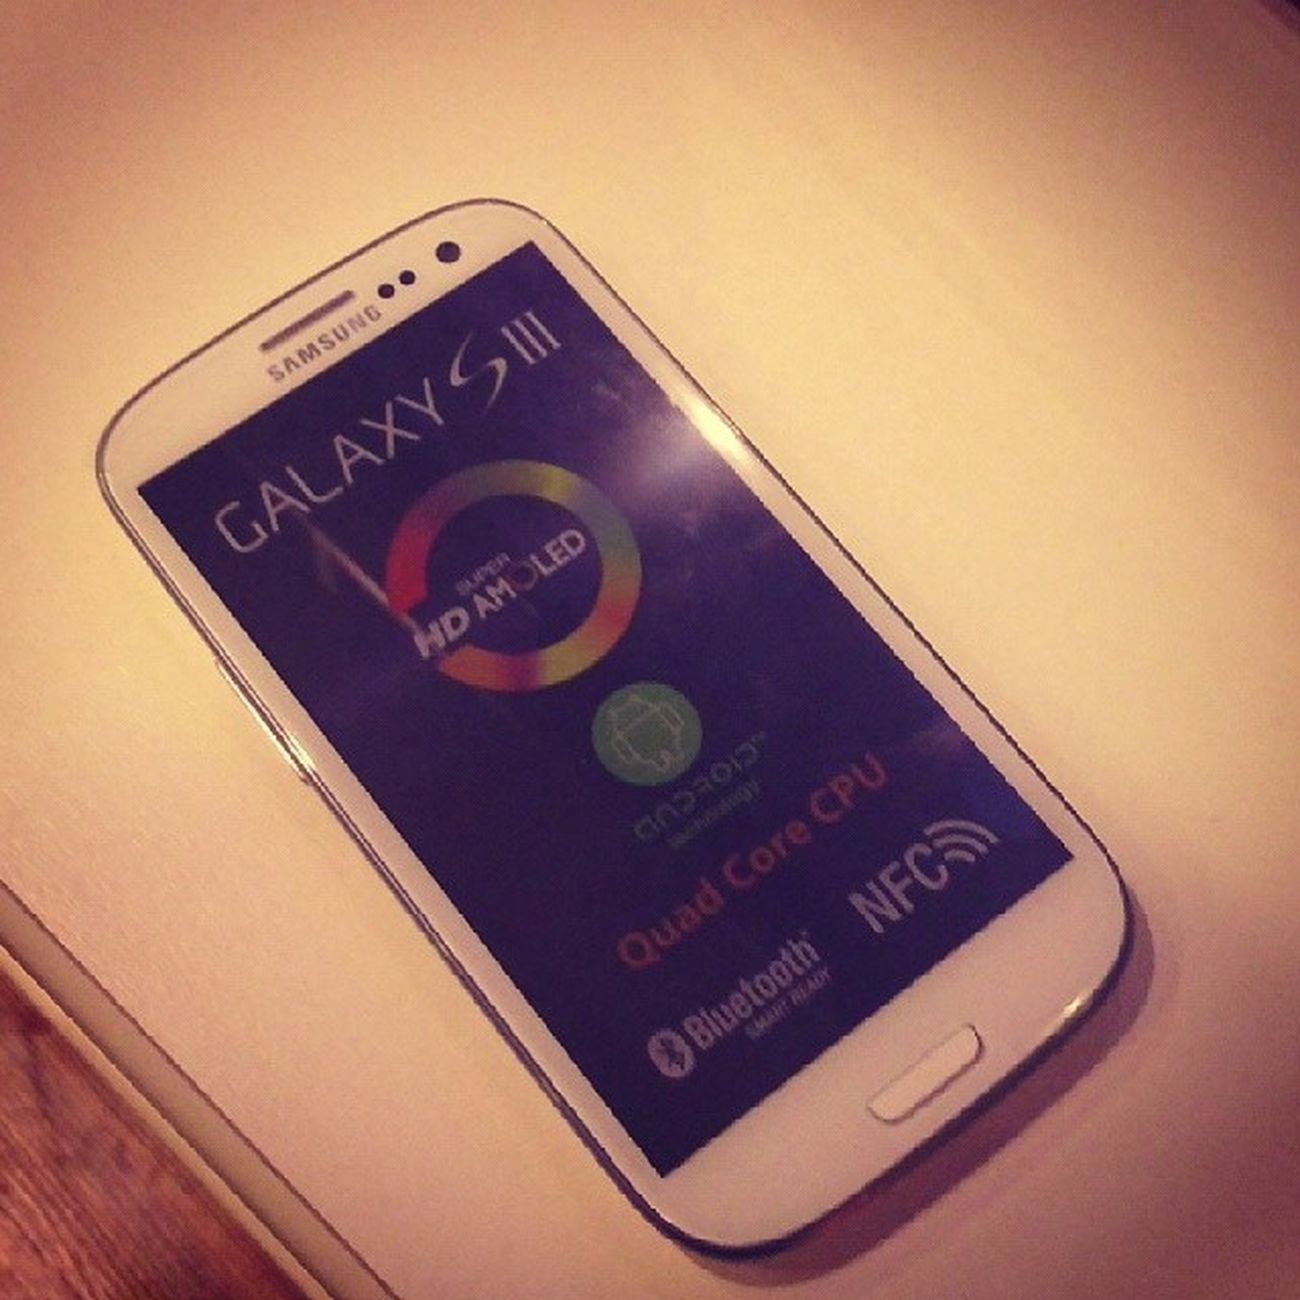 Mynewphone Samsung S3 Welcome homelikeabossgoodphonethanks